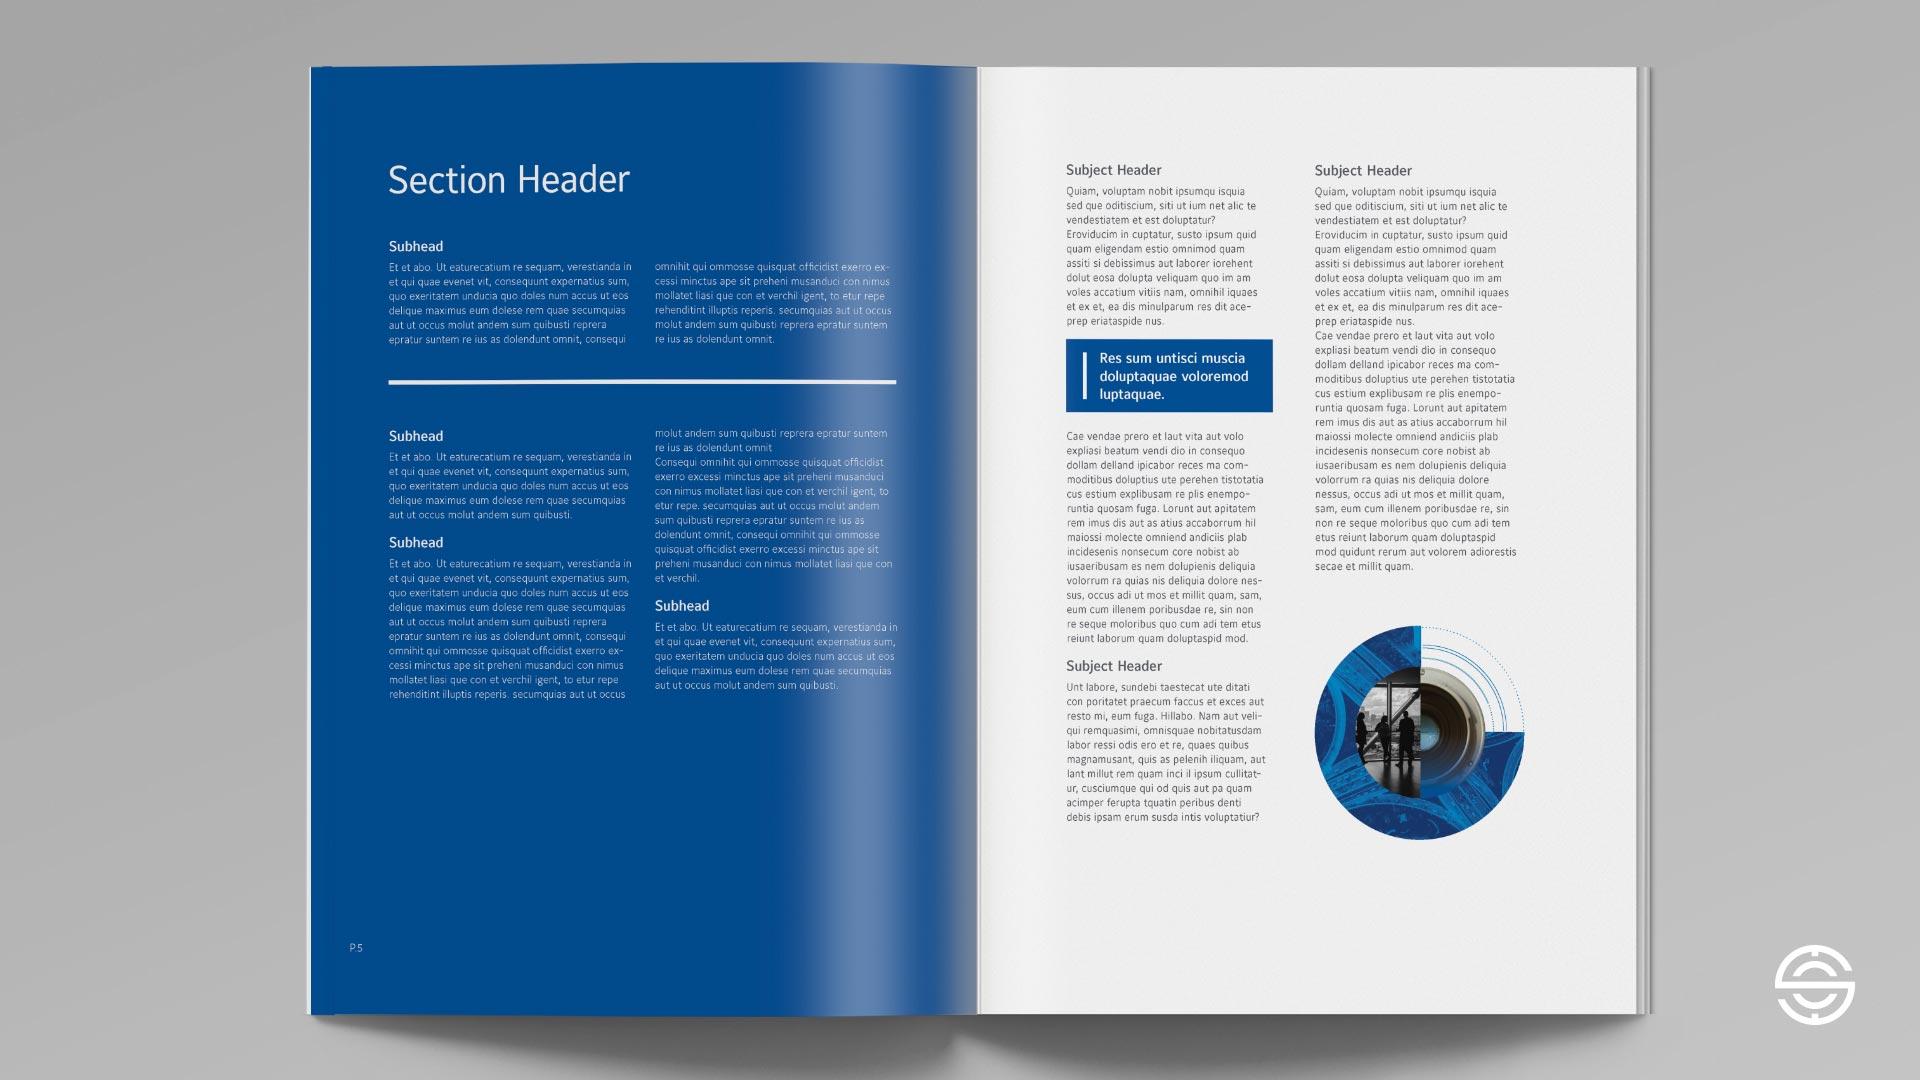 Proposed Johnson Controls Digital Solutions spread design